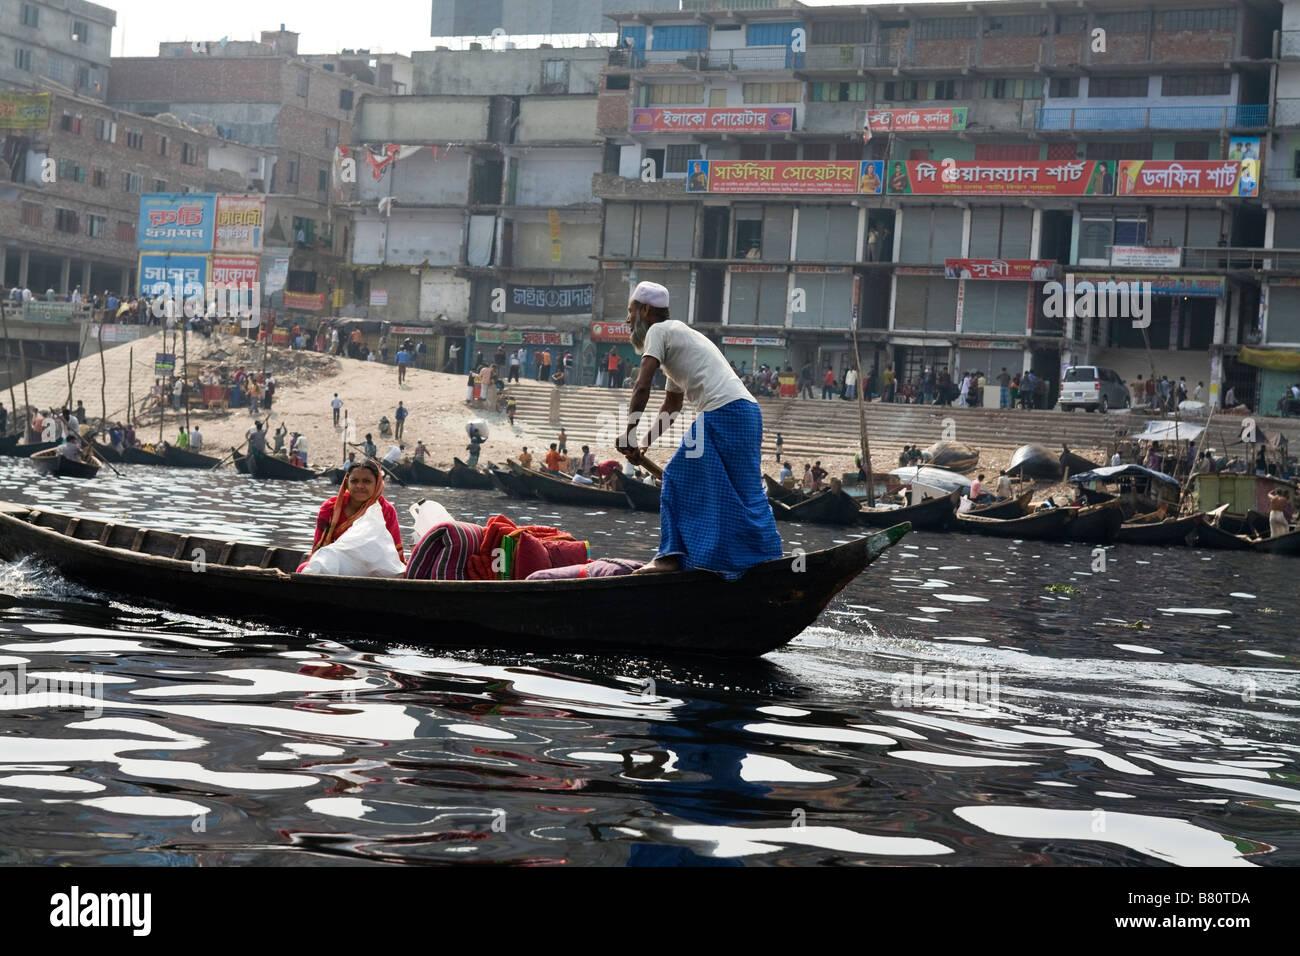 Boat on Buriganga River Bangladesh - Stock Image